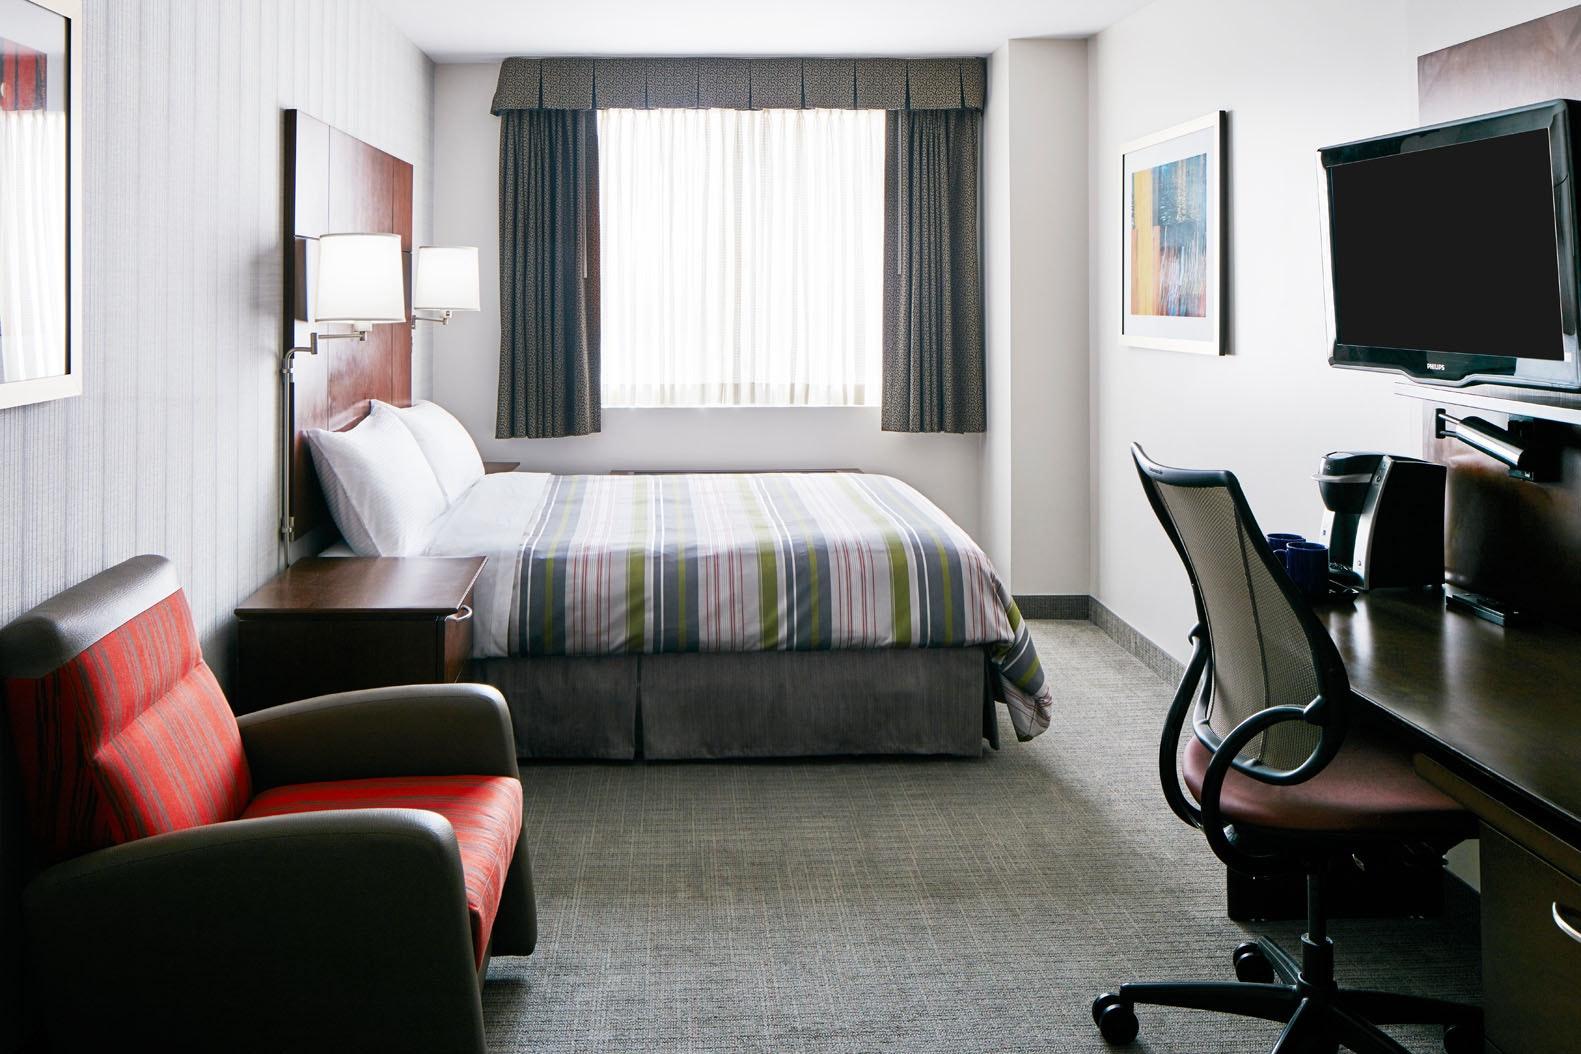 Standard Room Club Quarters Hotel in San